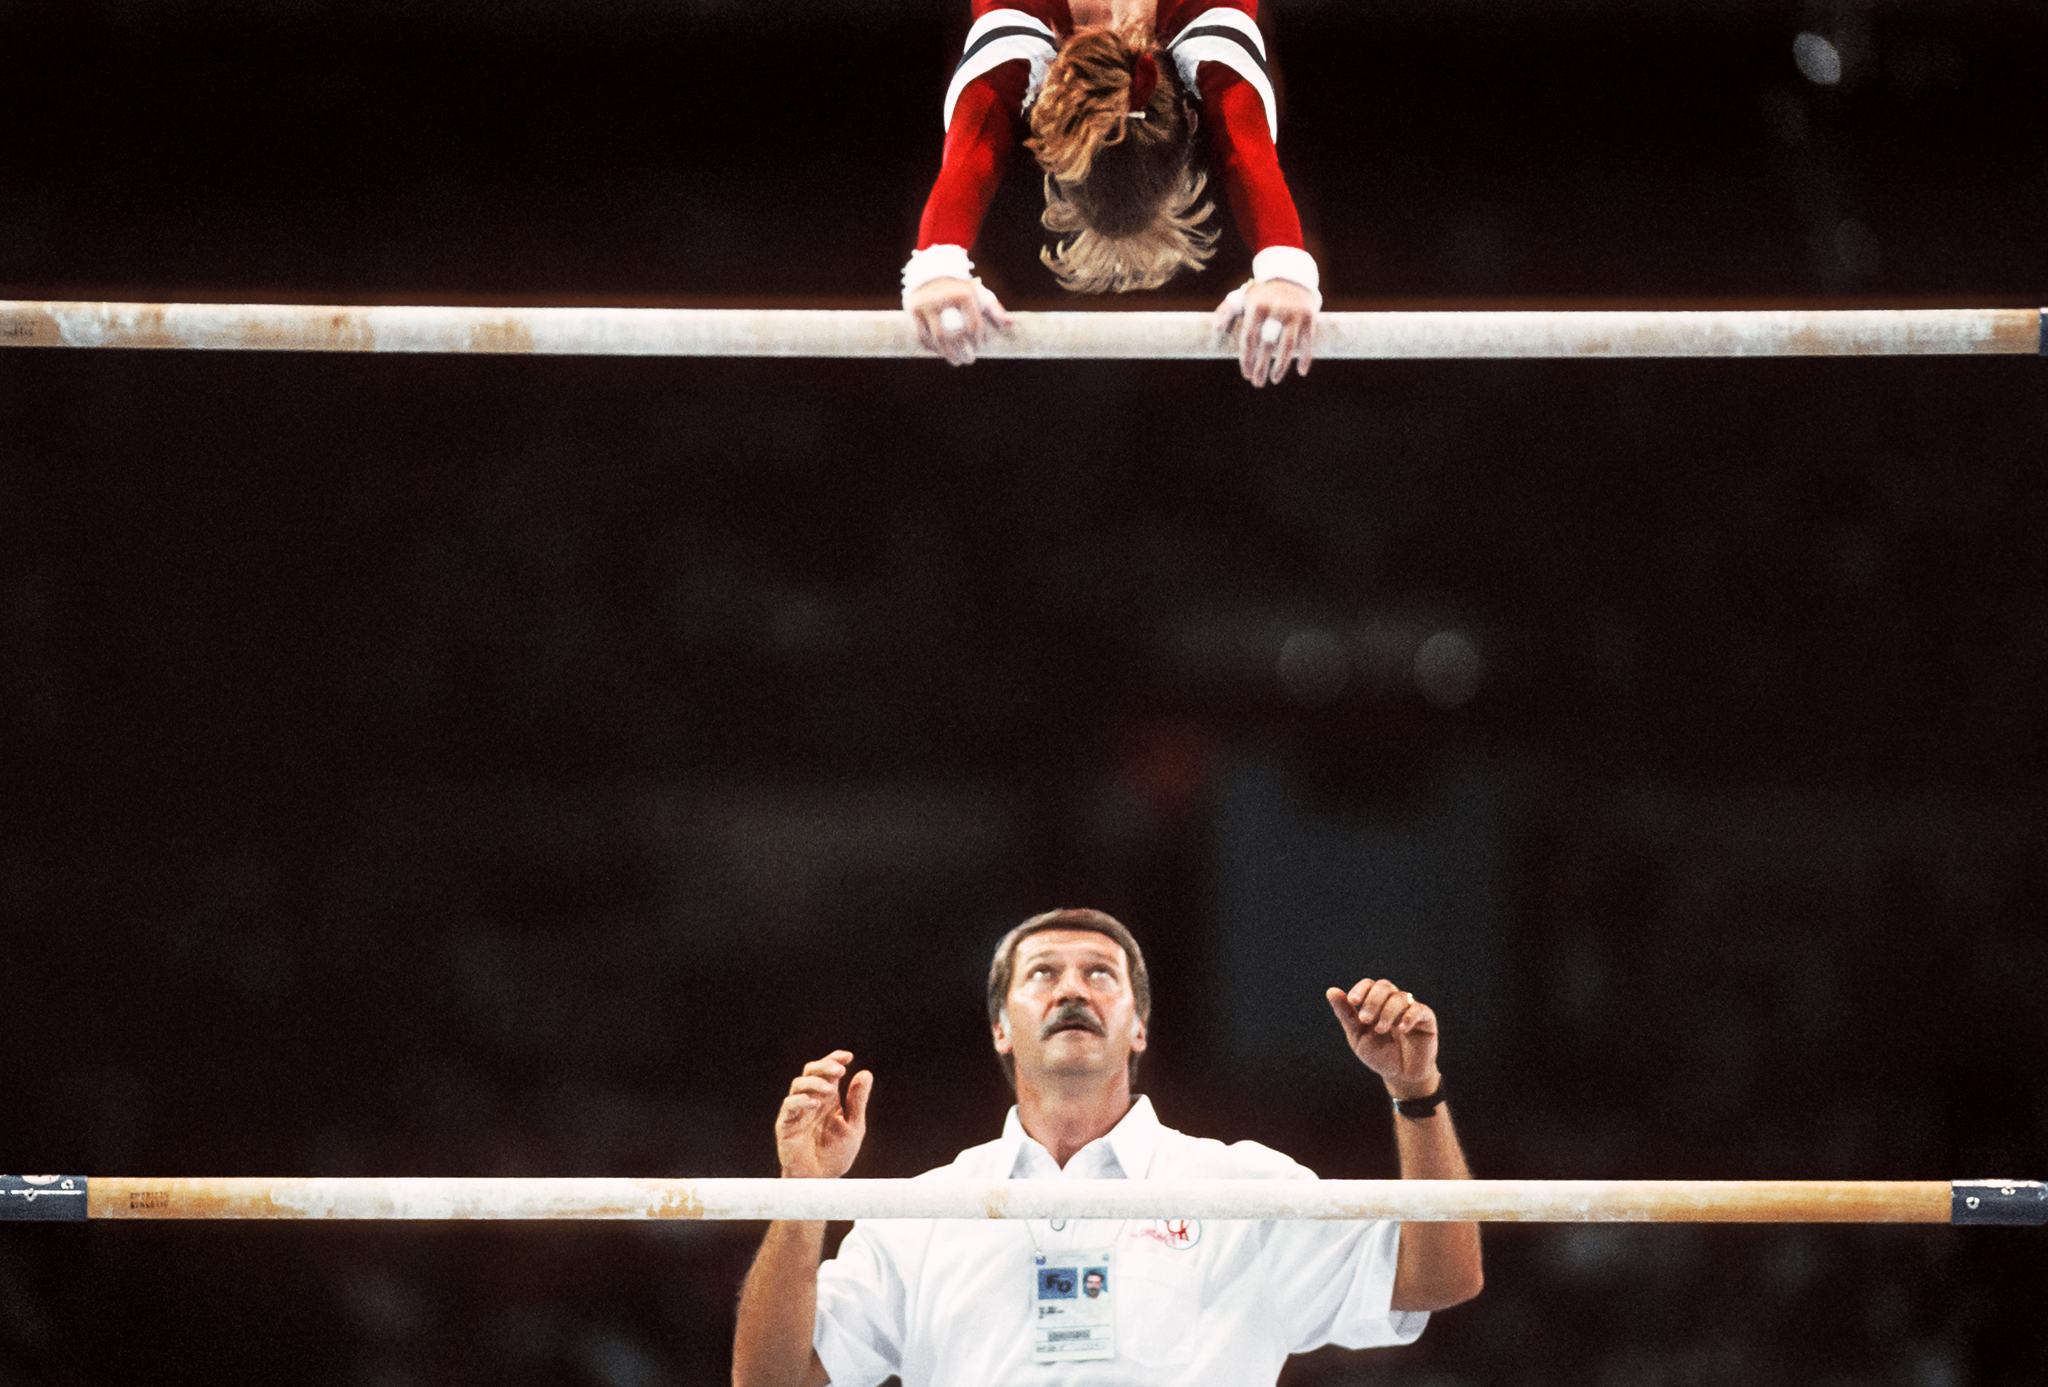 Coach Béla Károlyi spotting gymnast Kim Zmeskal